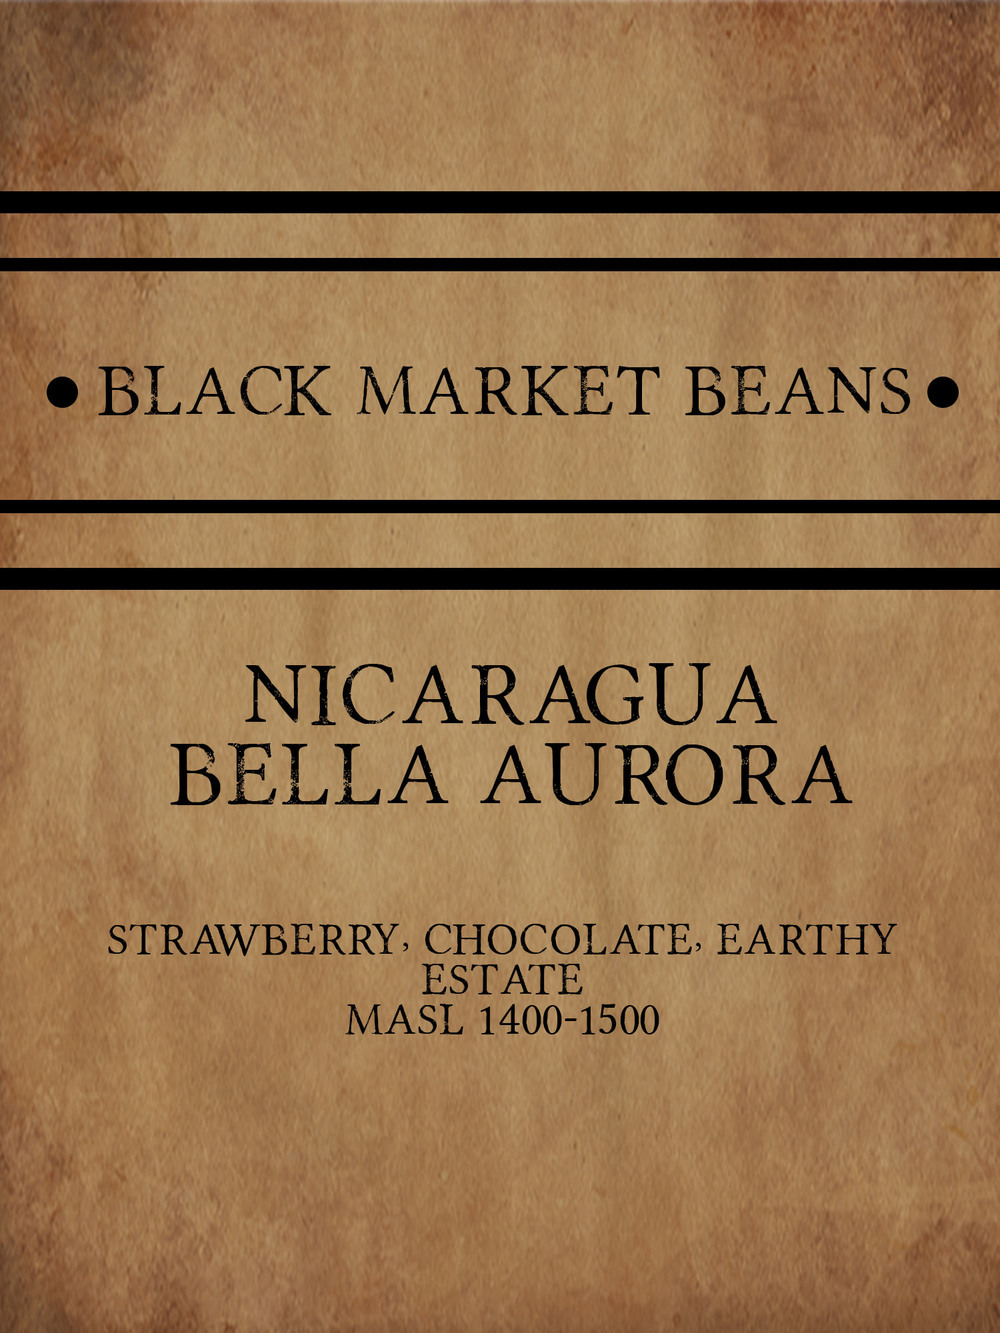 coffee_Nicaragua_bella aurora.jpg